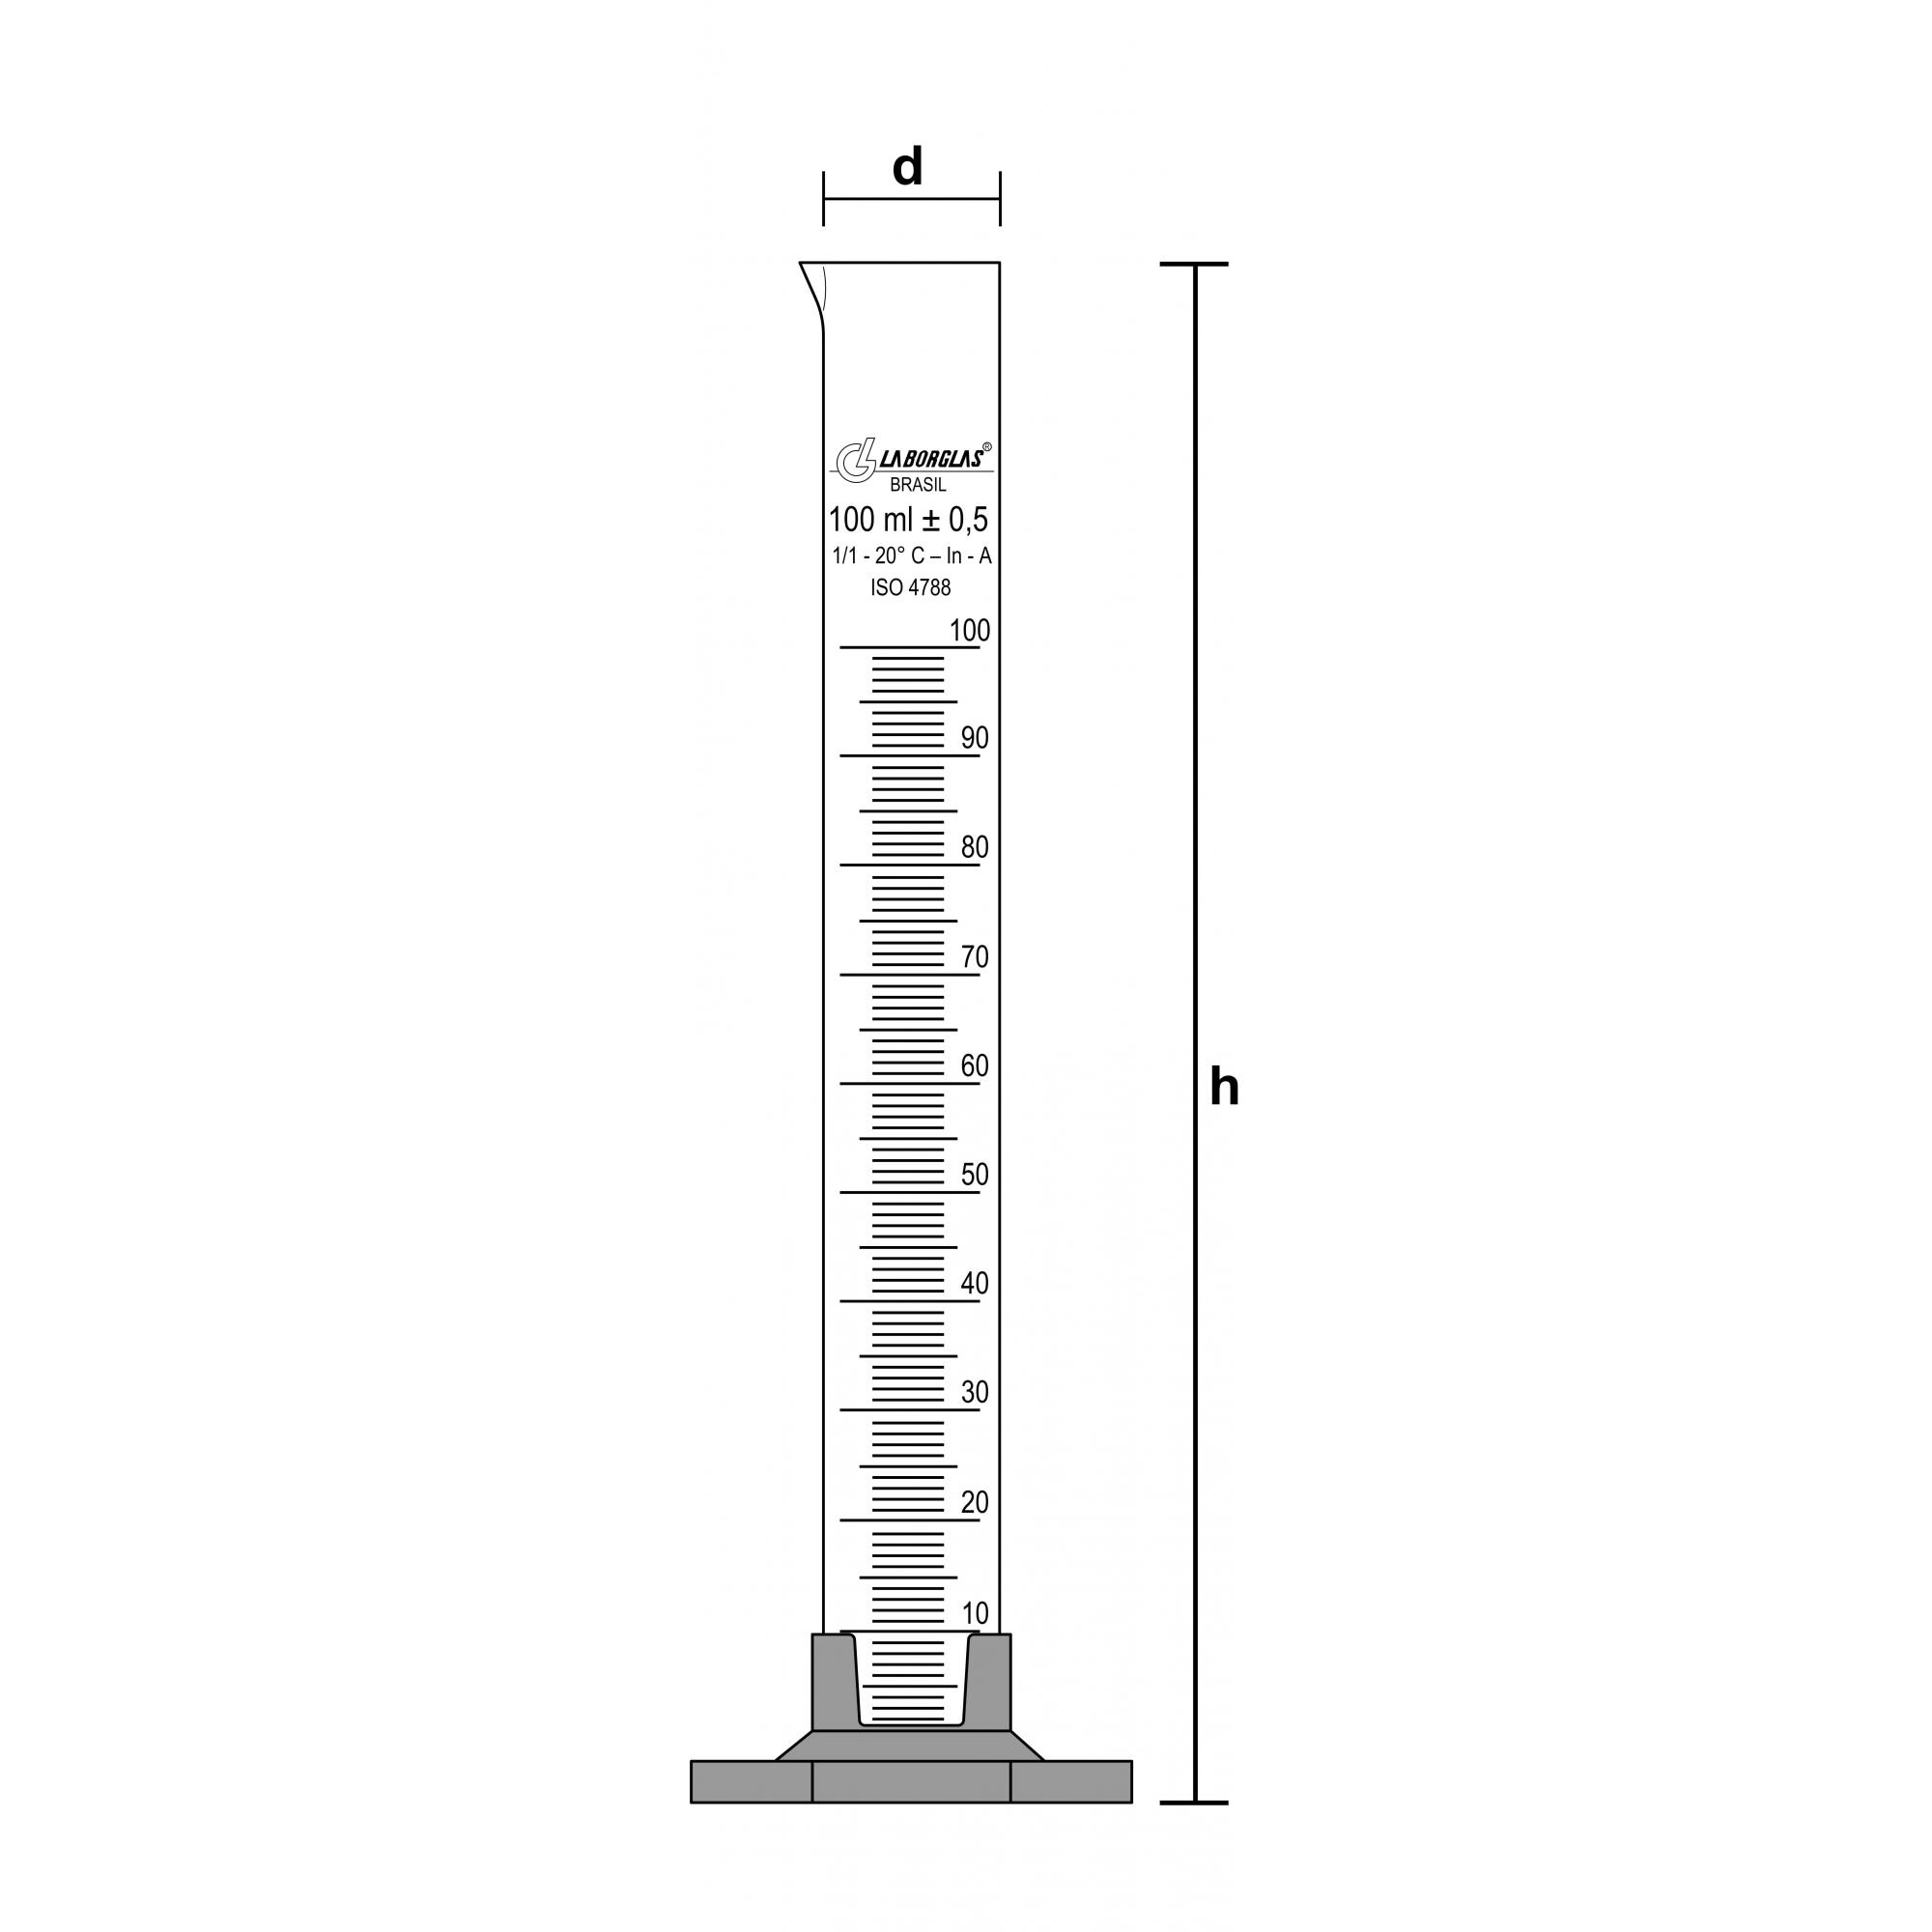 PROVETA GRADUADA BASE HEXAGONAL DE POLIPROPILENO 25 ML CLASSE A CERTIFICADO RASTREÁVEL - Laborglas - Cód. 9138714-C